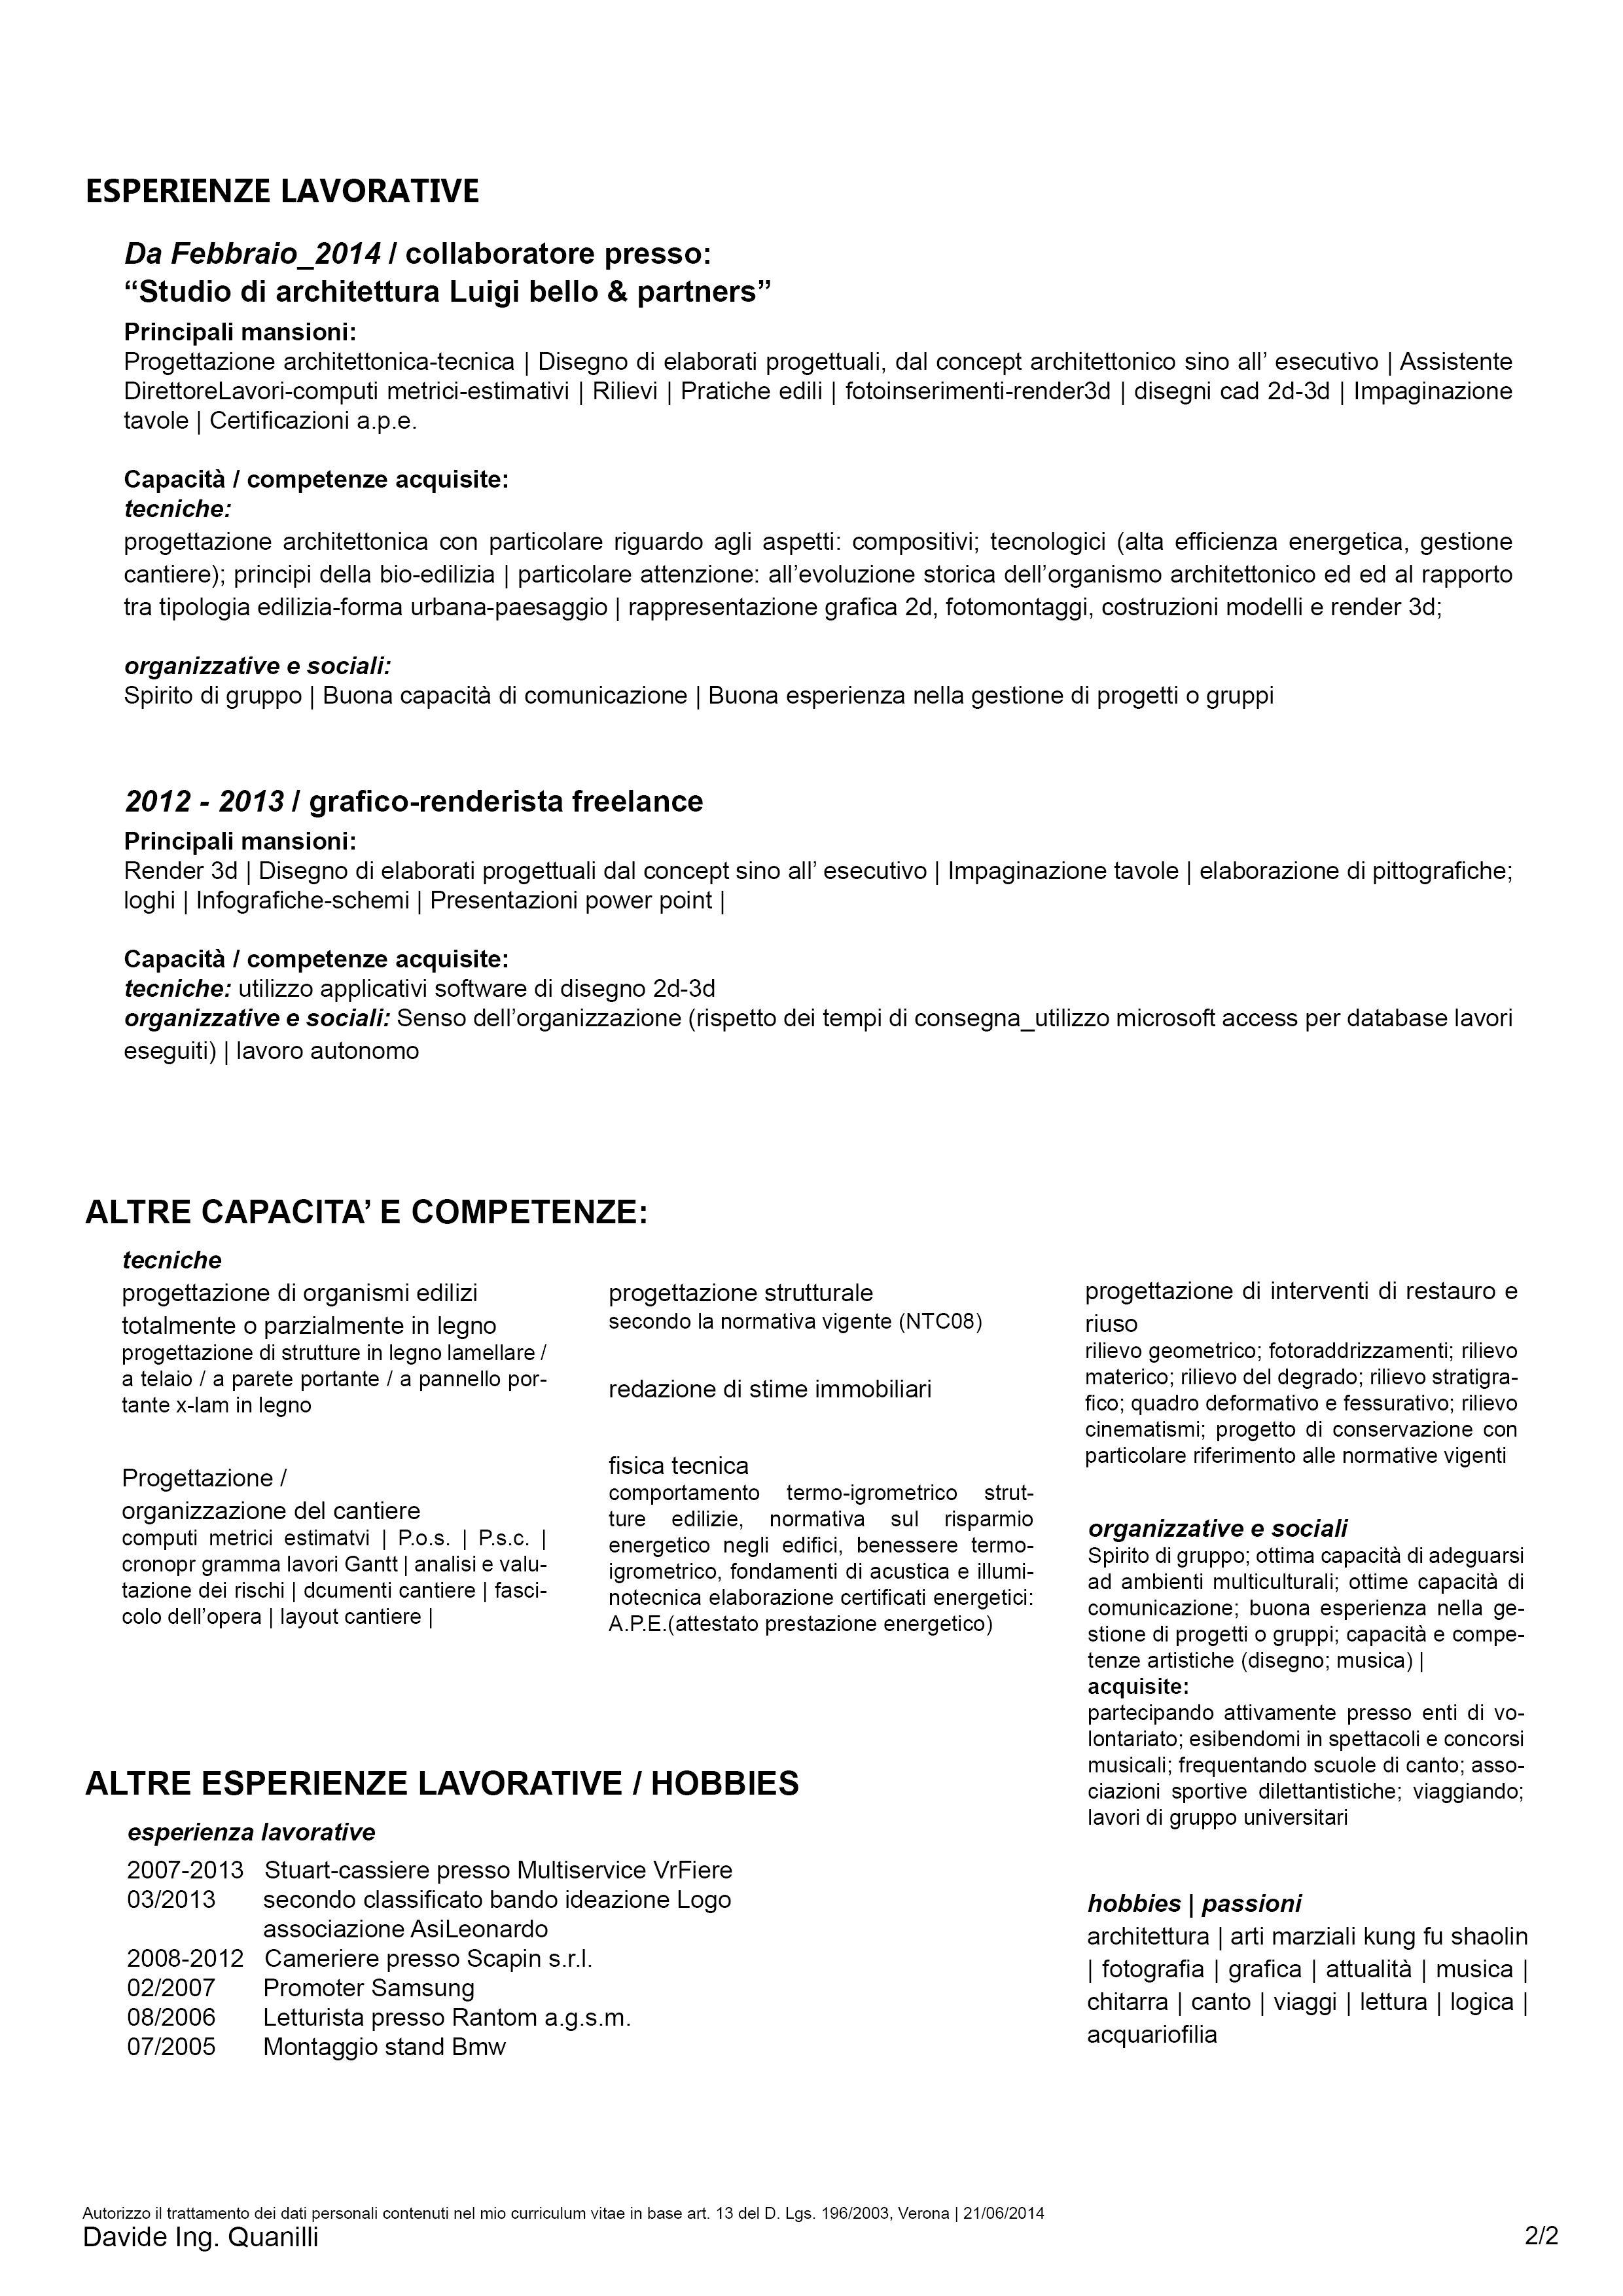 Curriculum Vitae Davide Ing Quanilli Pag2 Mail Davide Ingarch